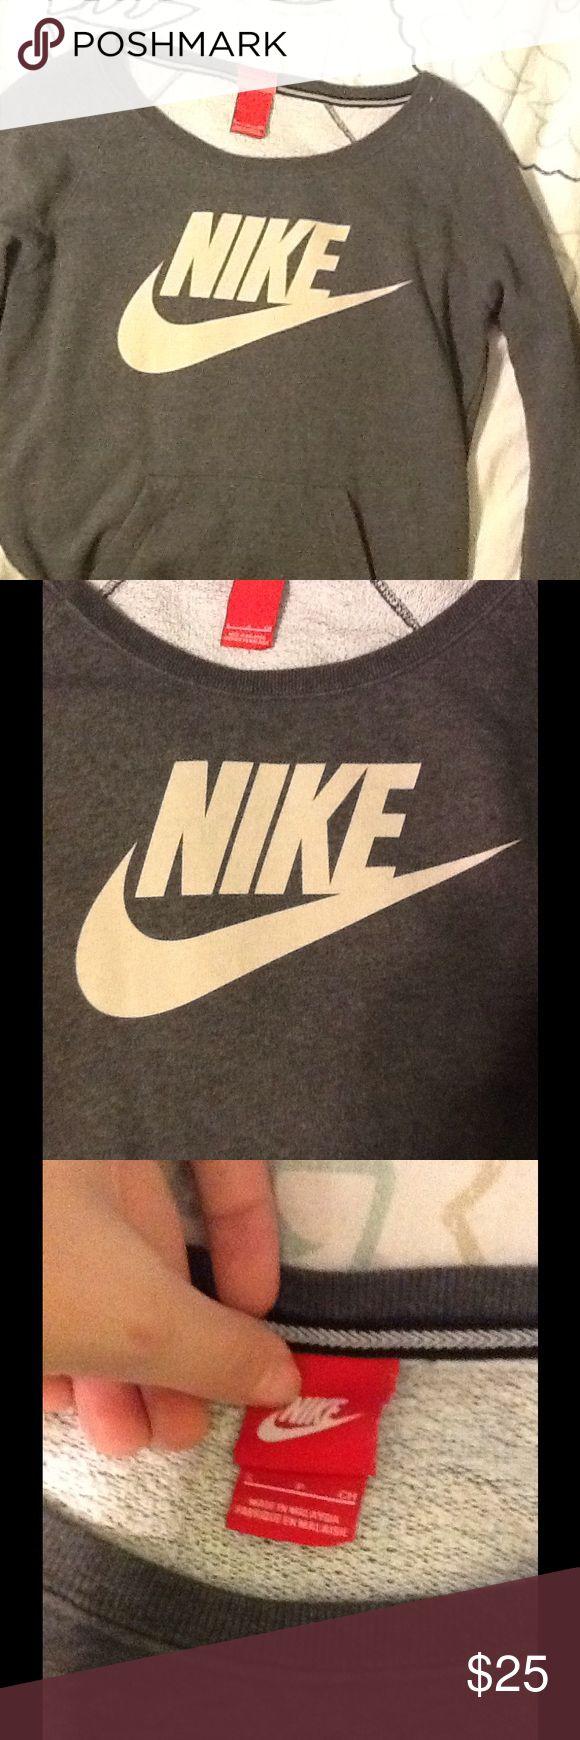 Nike crew neck sweatshirt Cute and warm Nike crew neck sweatshirt. Only worm 2 times, nothing wrong with it. Nike Tops Sweatshirts & Hoodies